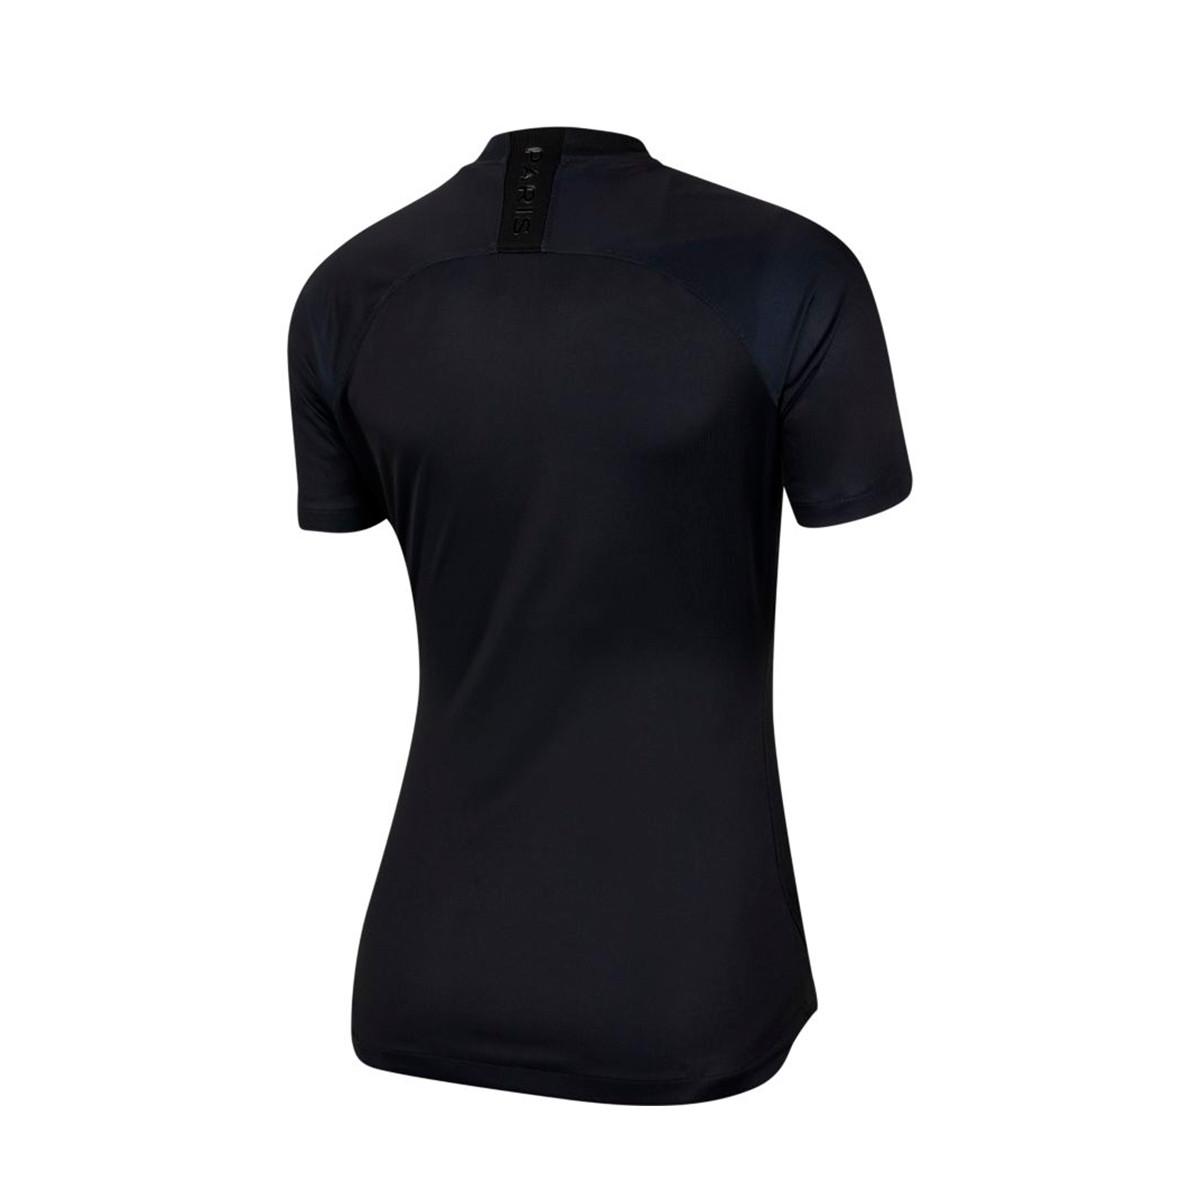 Maillot Nike Jordan X Psg Breathe Stadium 4eme Tenue 2019 2020 Femme Black White Boutique De Football Futbol Emotion